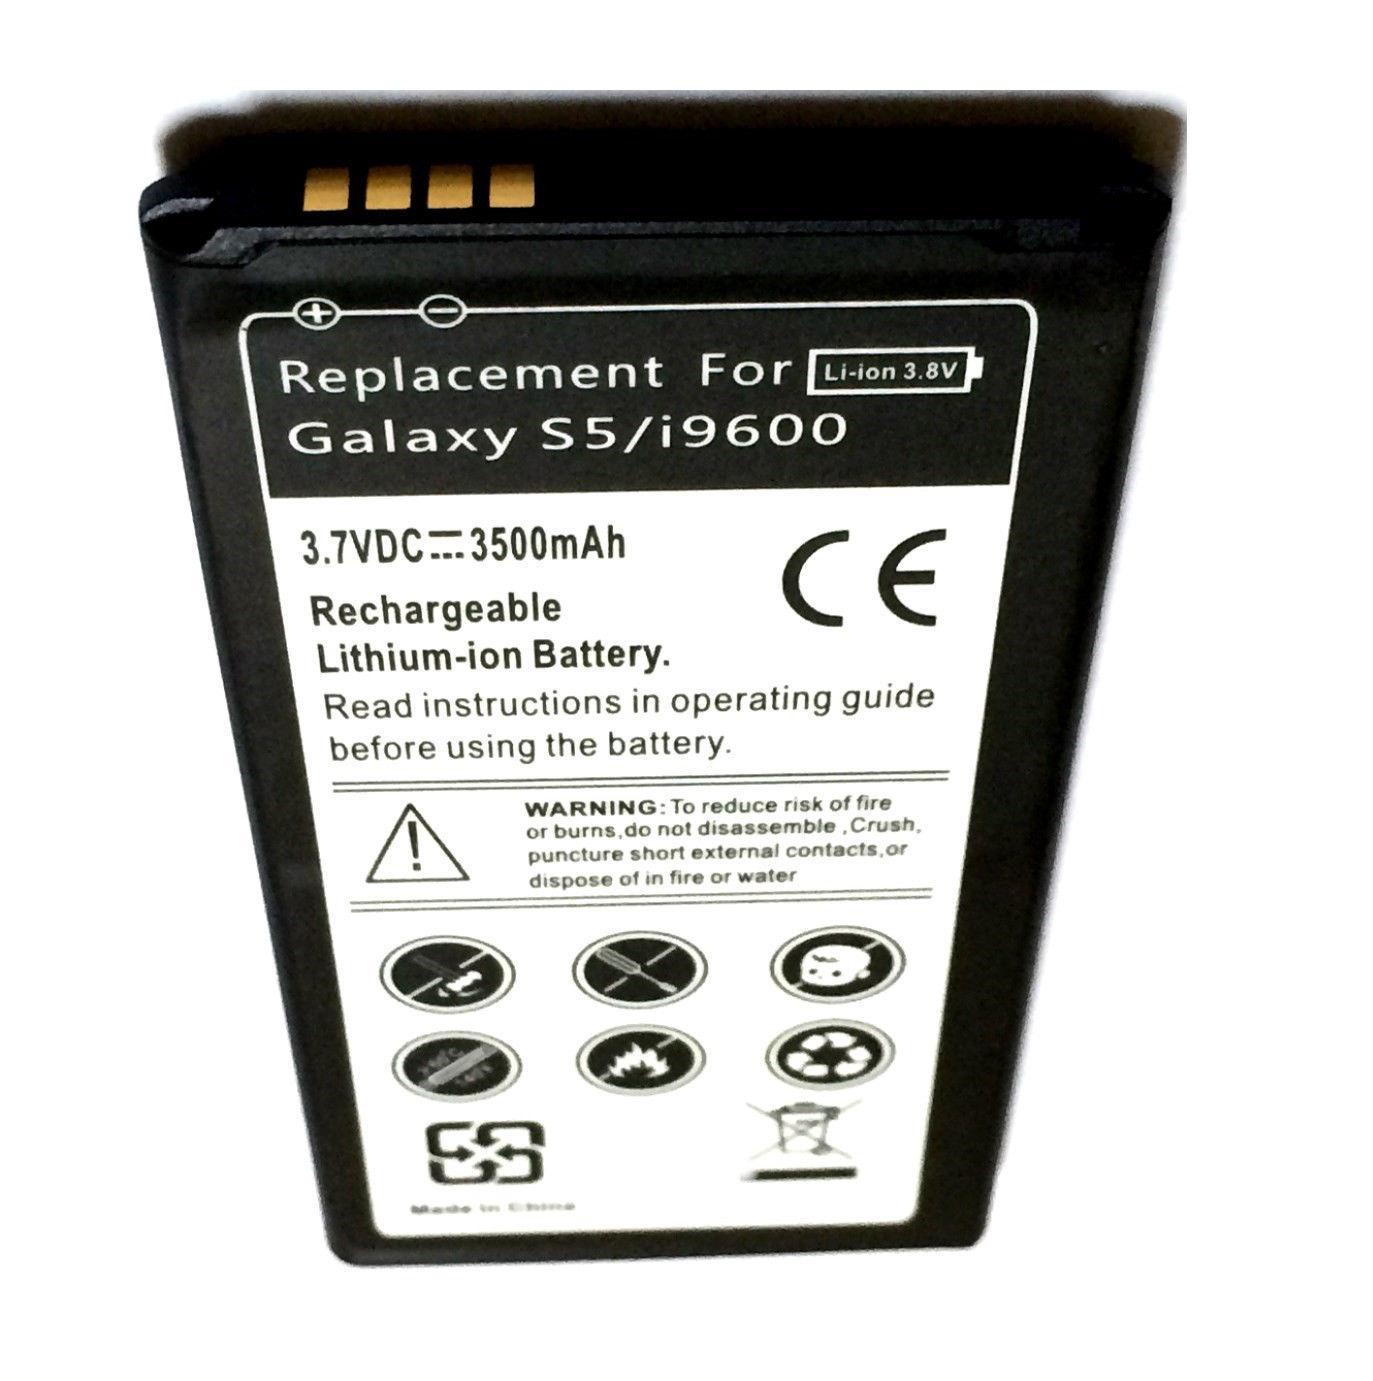 Samsung Galaxy S5 Slim Extended Battery G9009D G900D G900F G900H G900I G900J USA